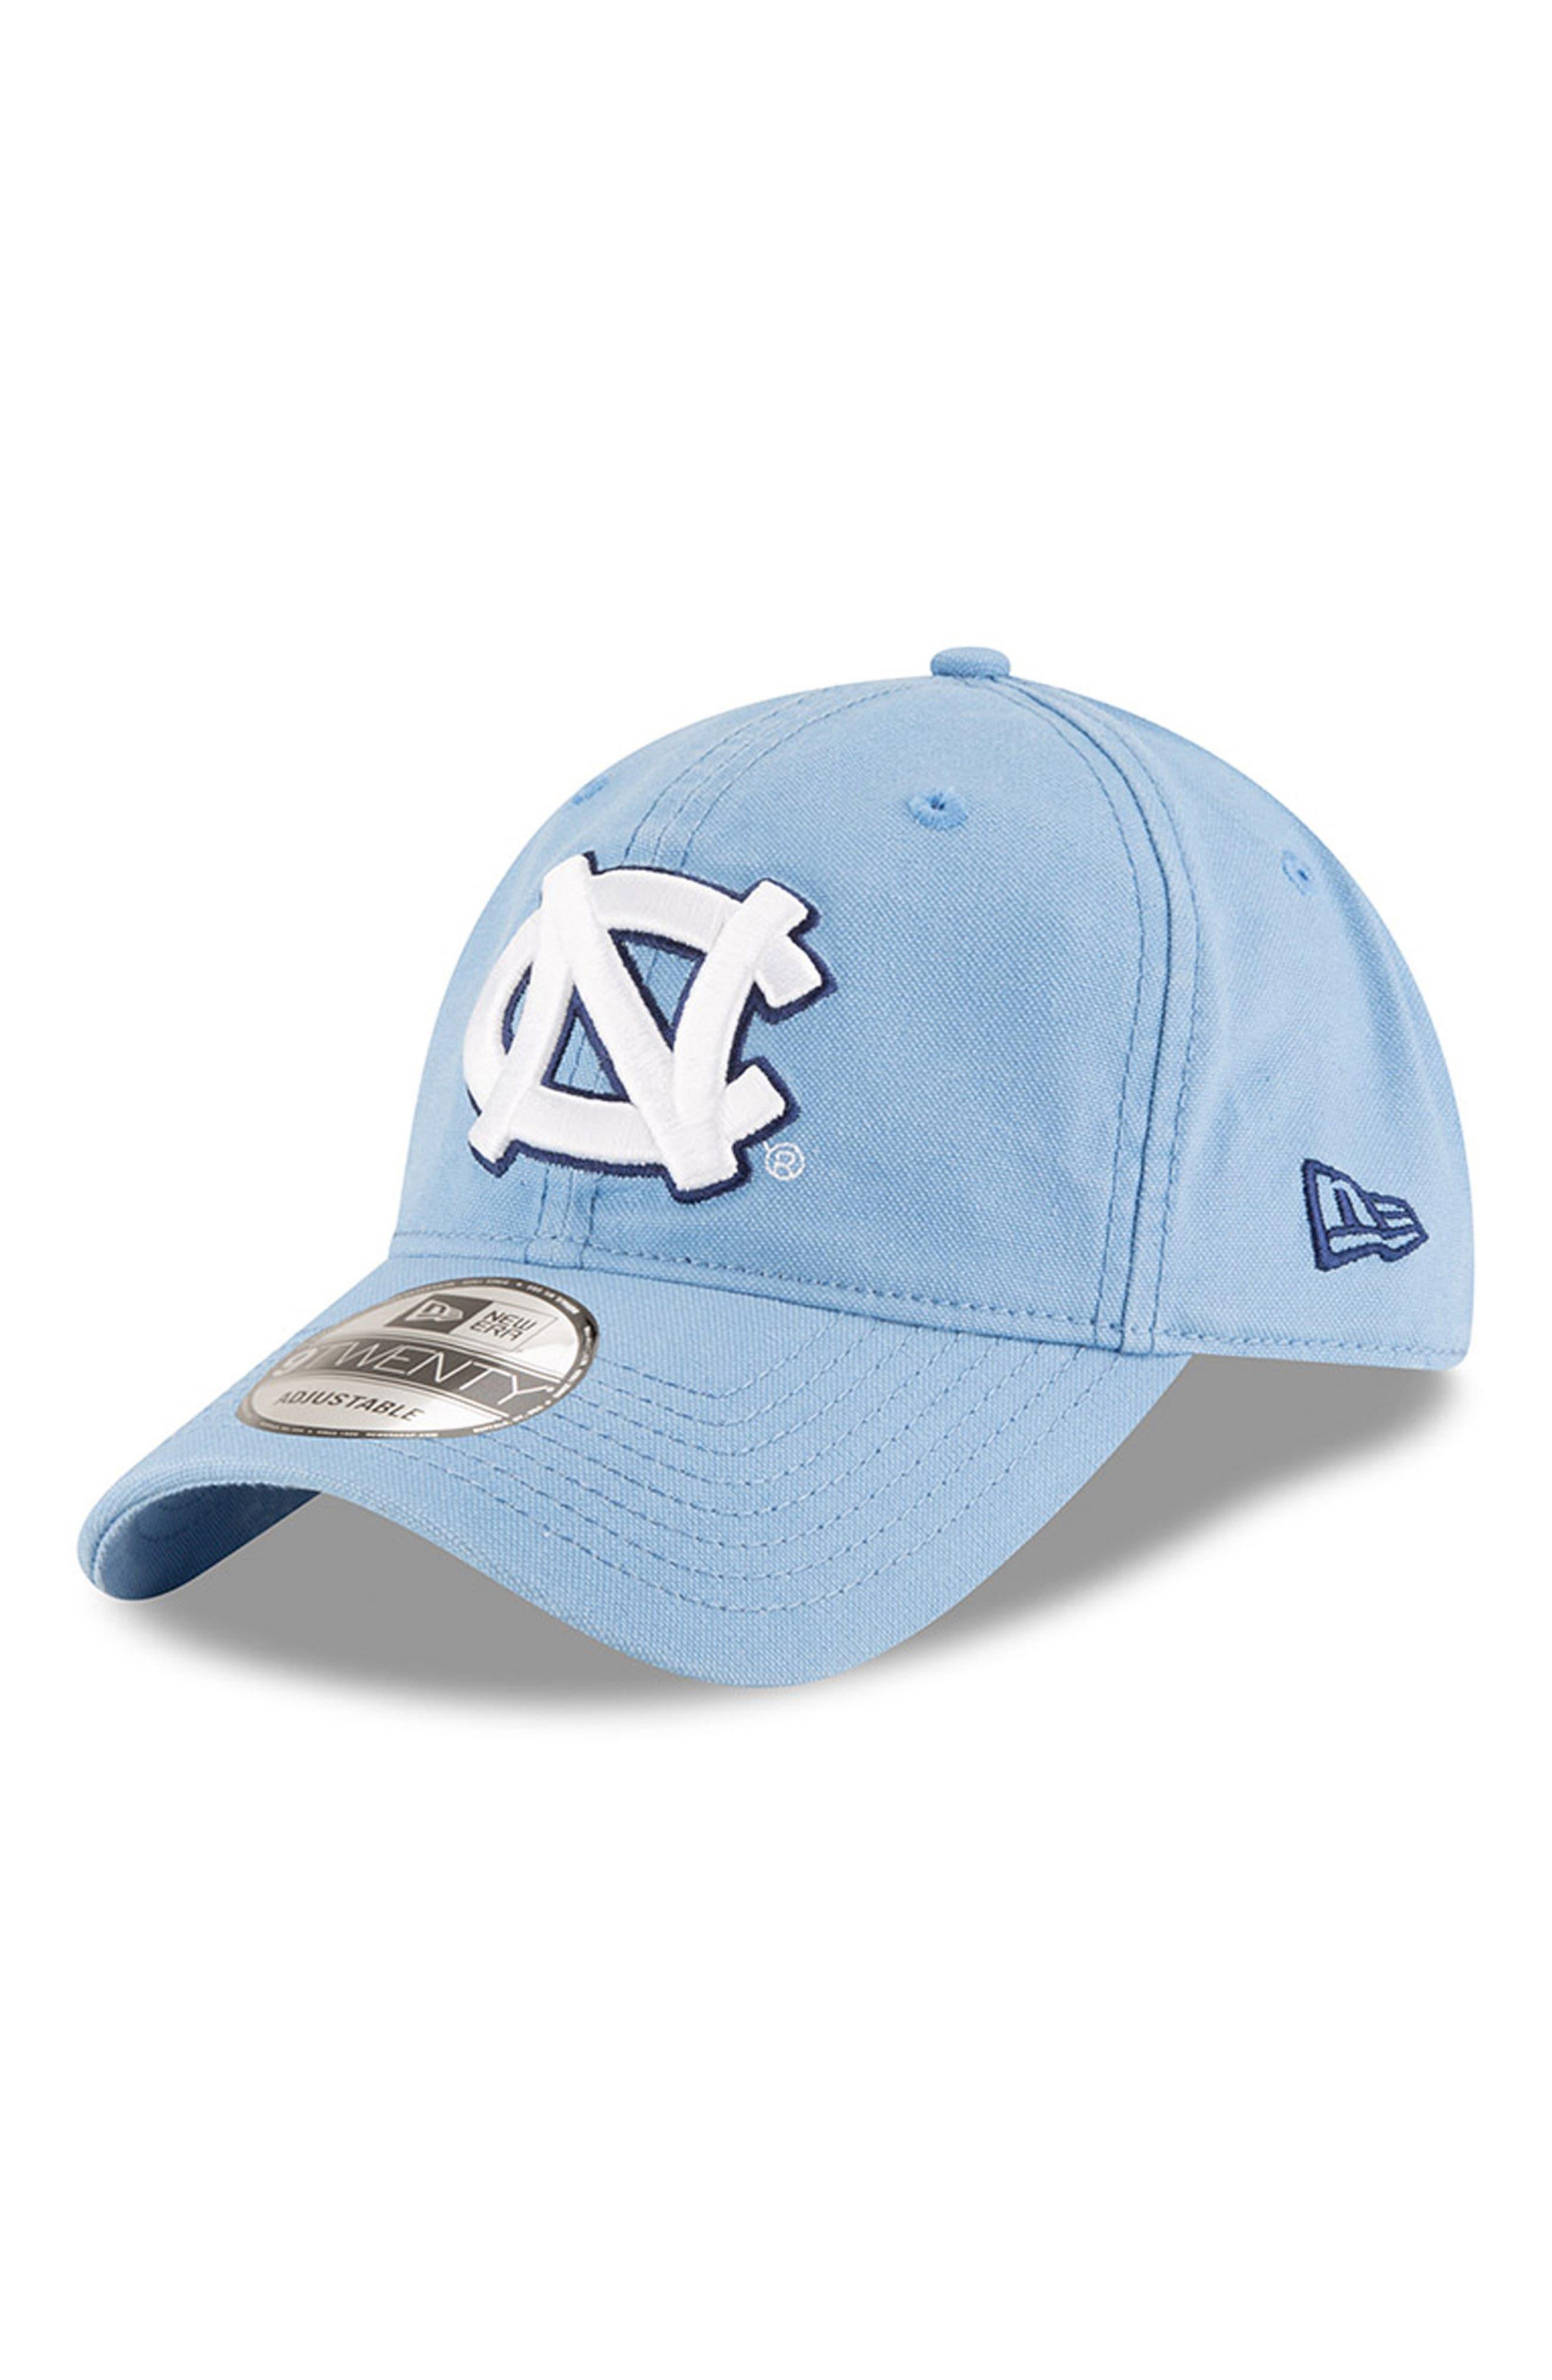 New Era Collegiate Core Classic - North Carolina Tar Heels Baseball Cap,                         Main,                         color, 450